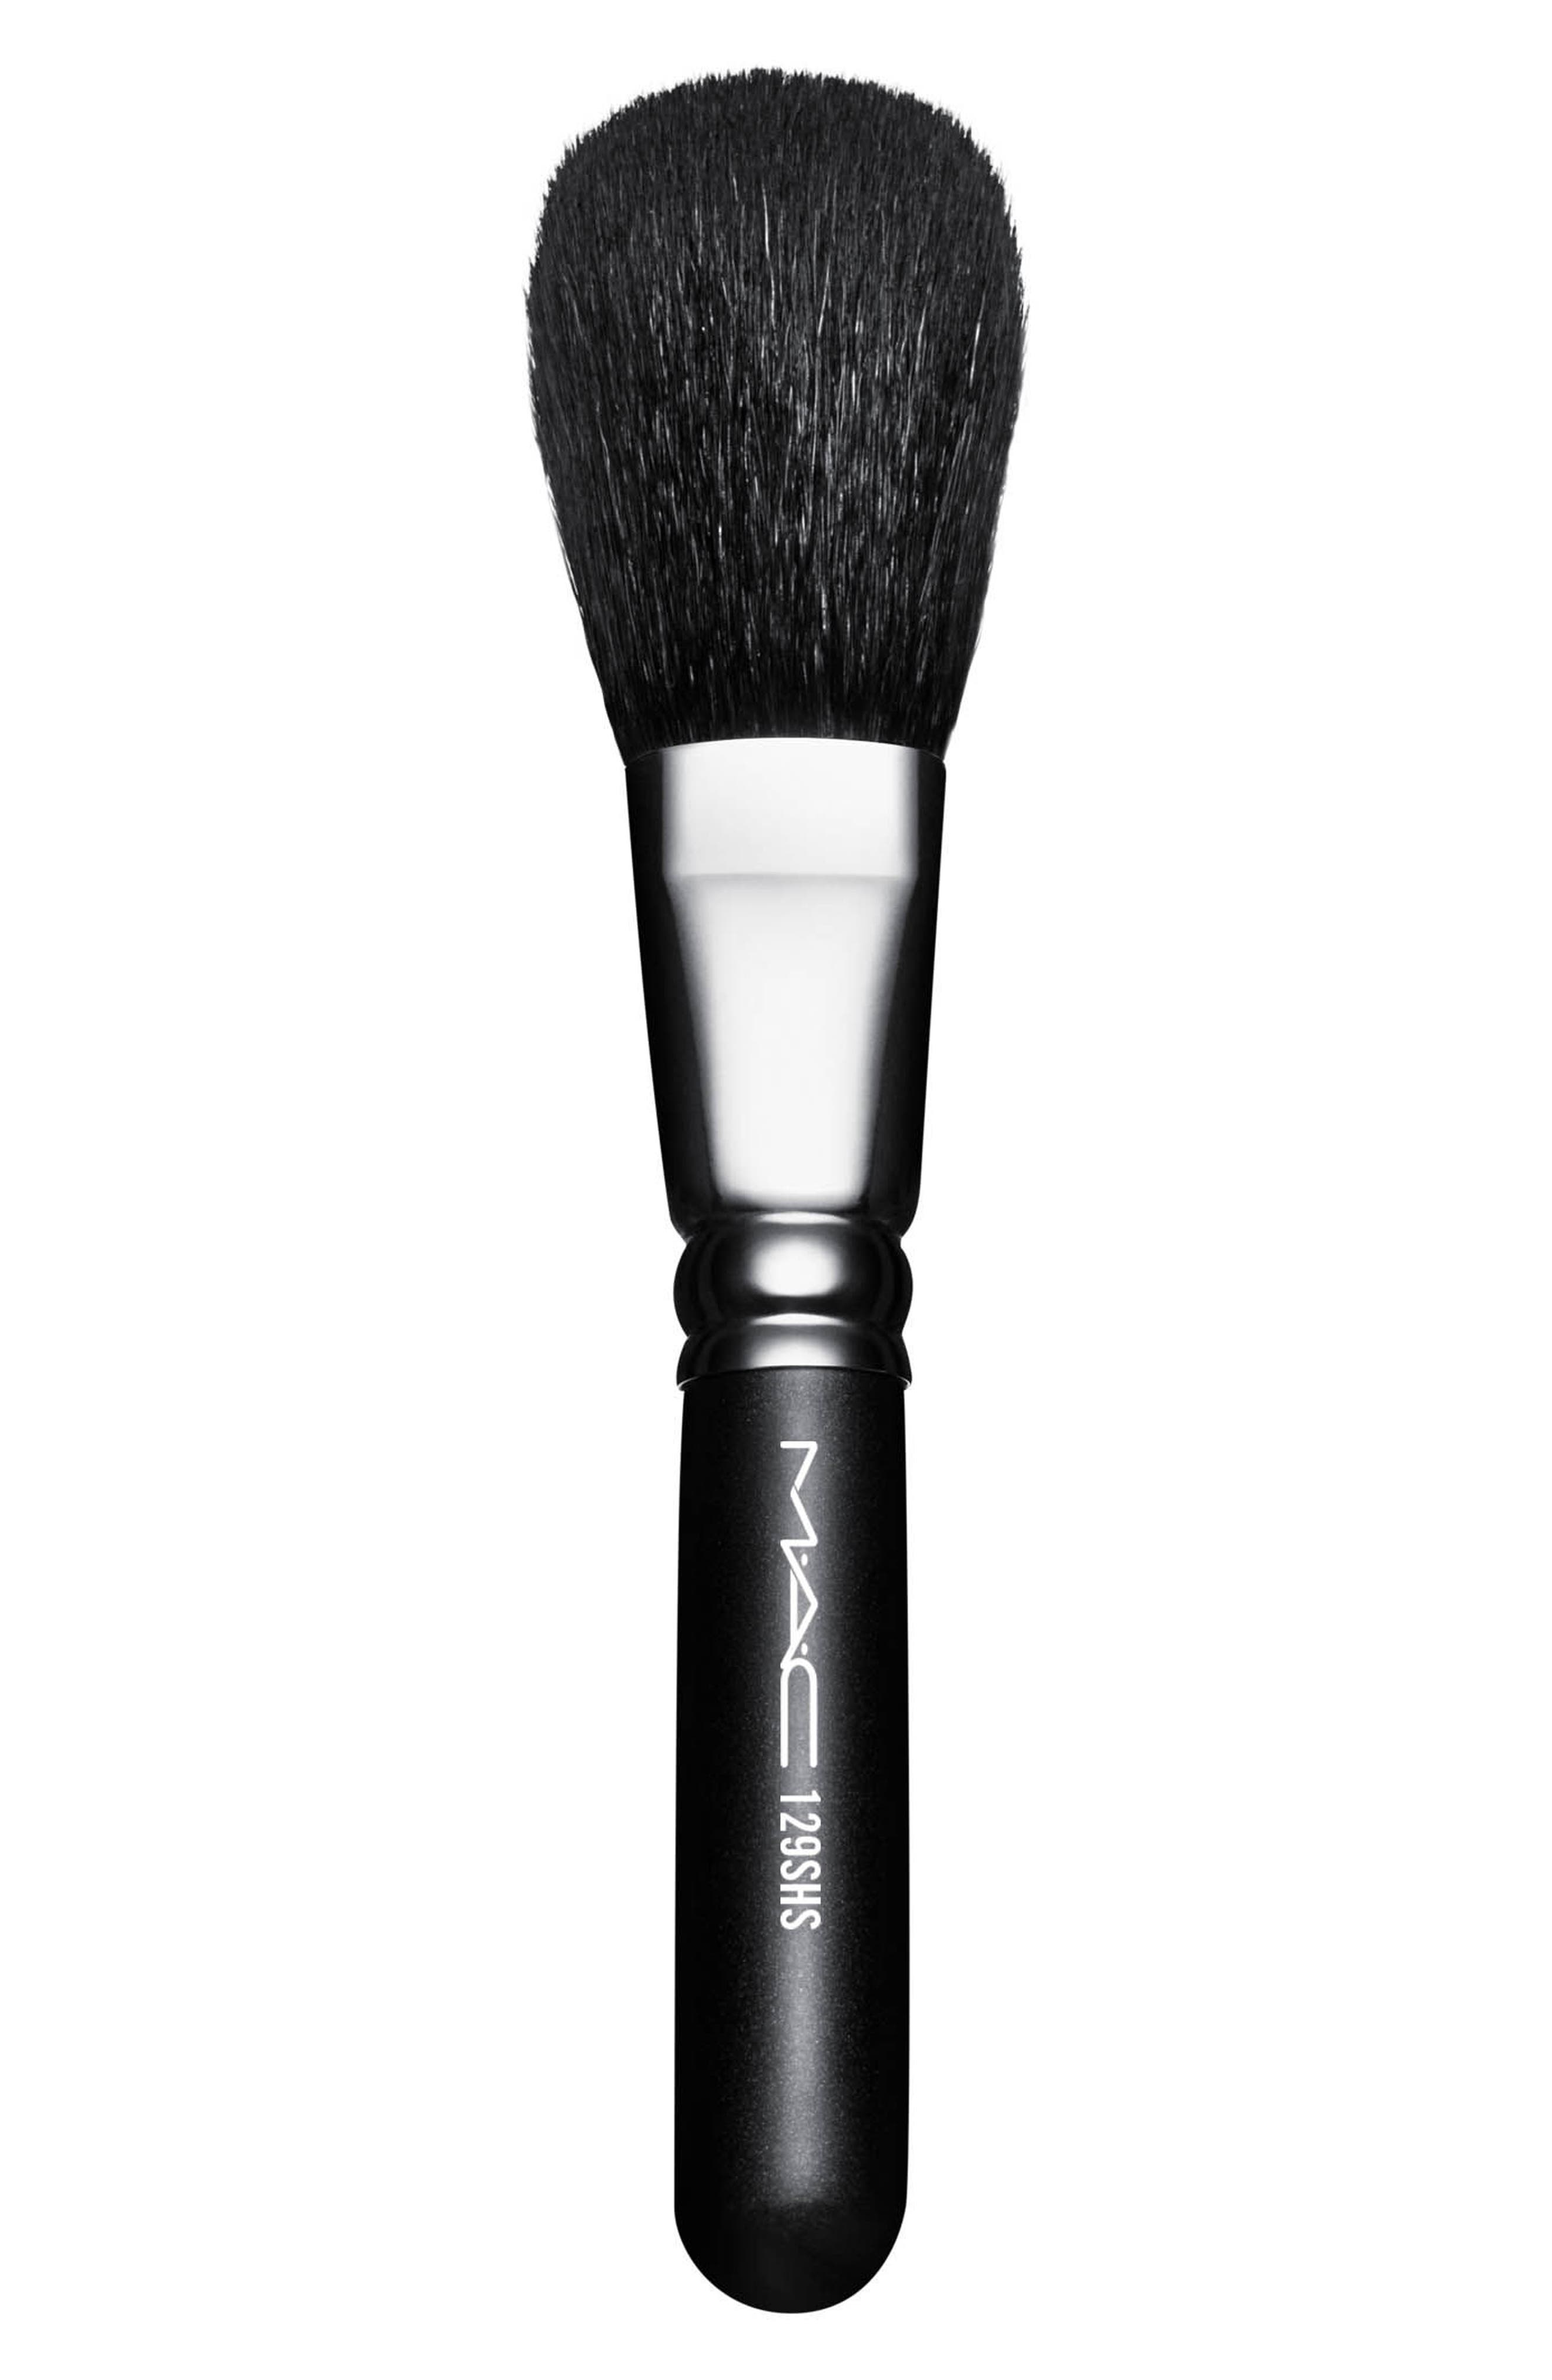 MAC 129Shs Synthetic Powder/blush Brush